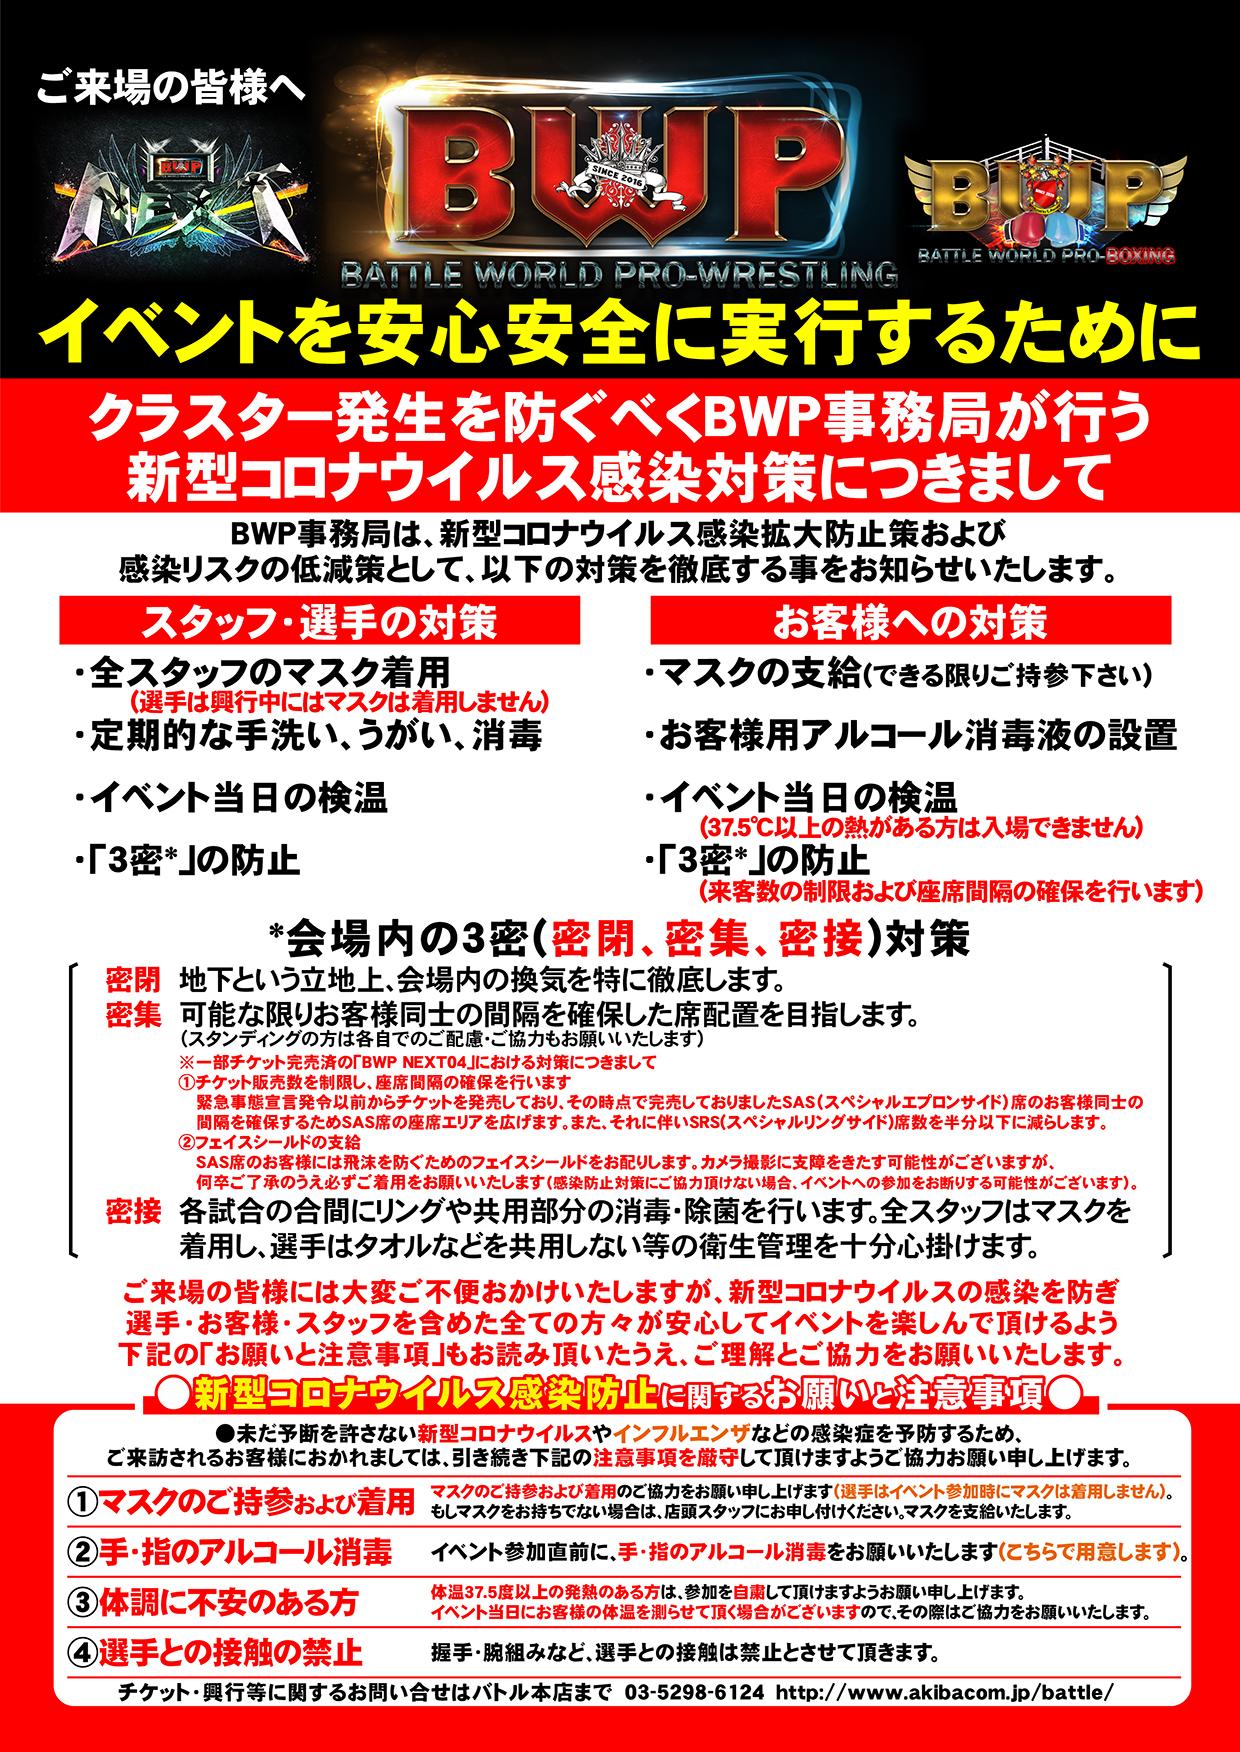 web【NEXT04版】新型コロナウィルス対策におけるBWP事務局の取り組み